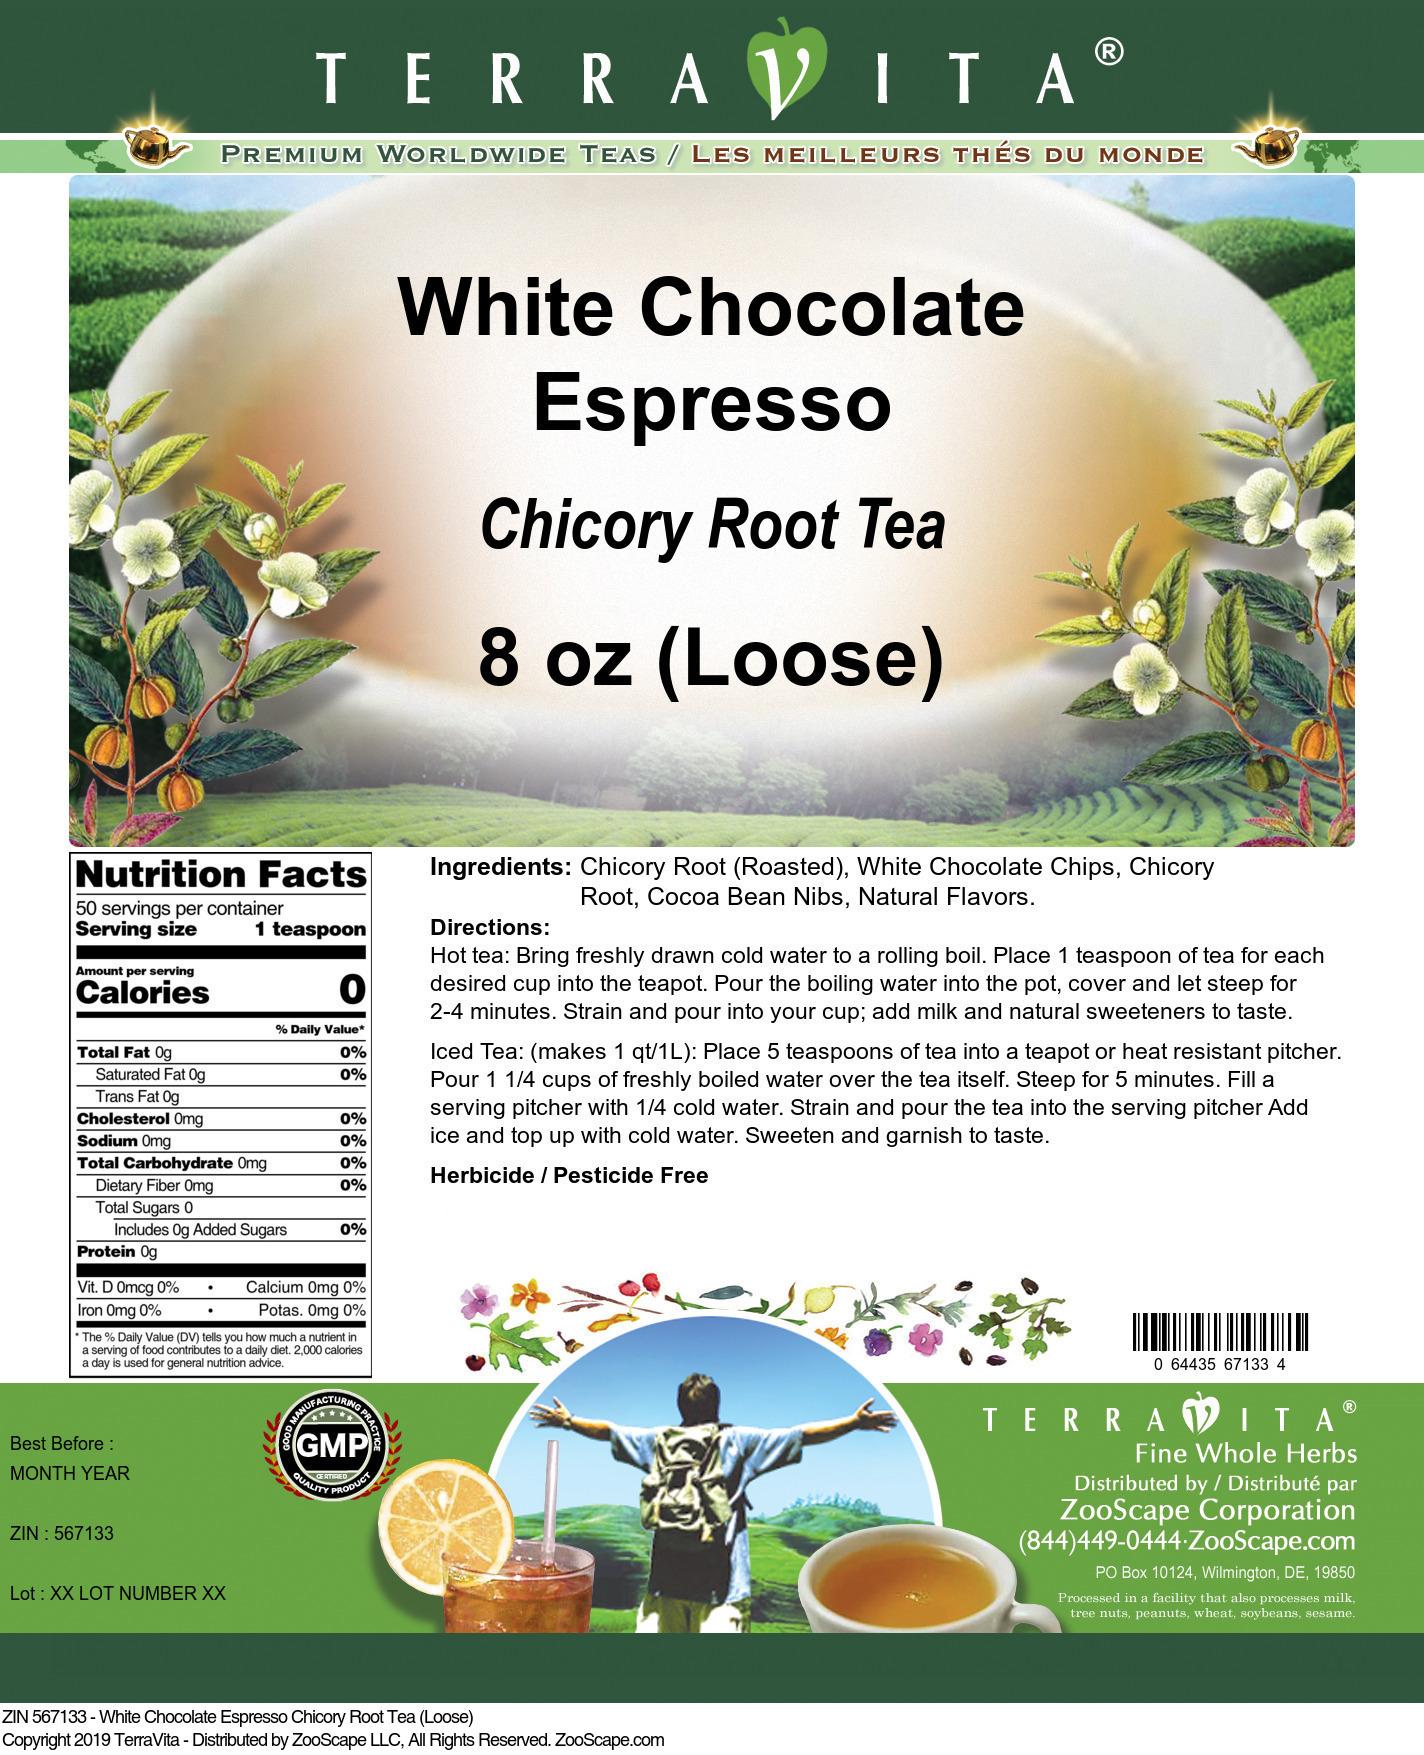 White Chocolate Espresso Chicory Root Tea (Loose)